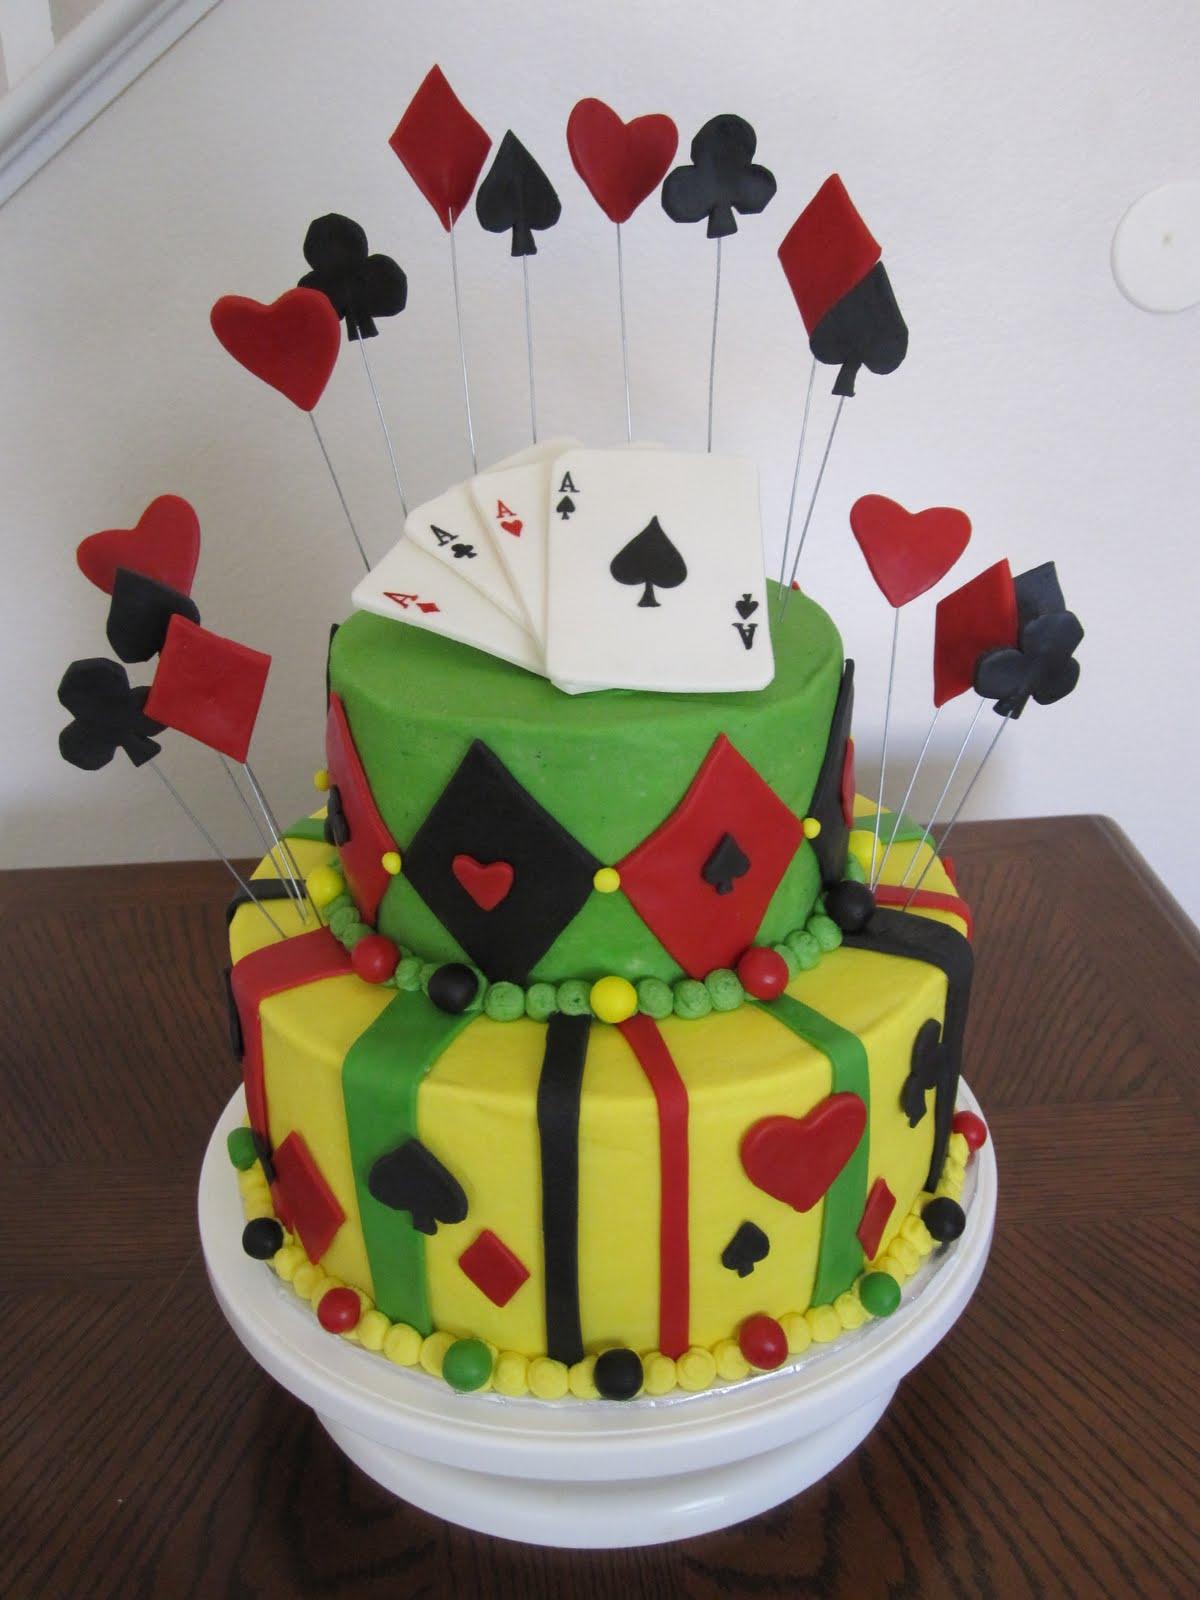 Cake Designs Playing Cards : Ms. Cakes: Playing Card Cake